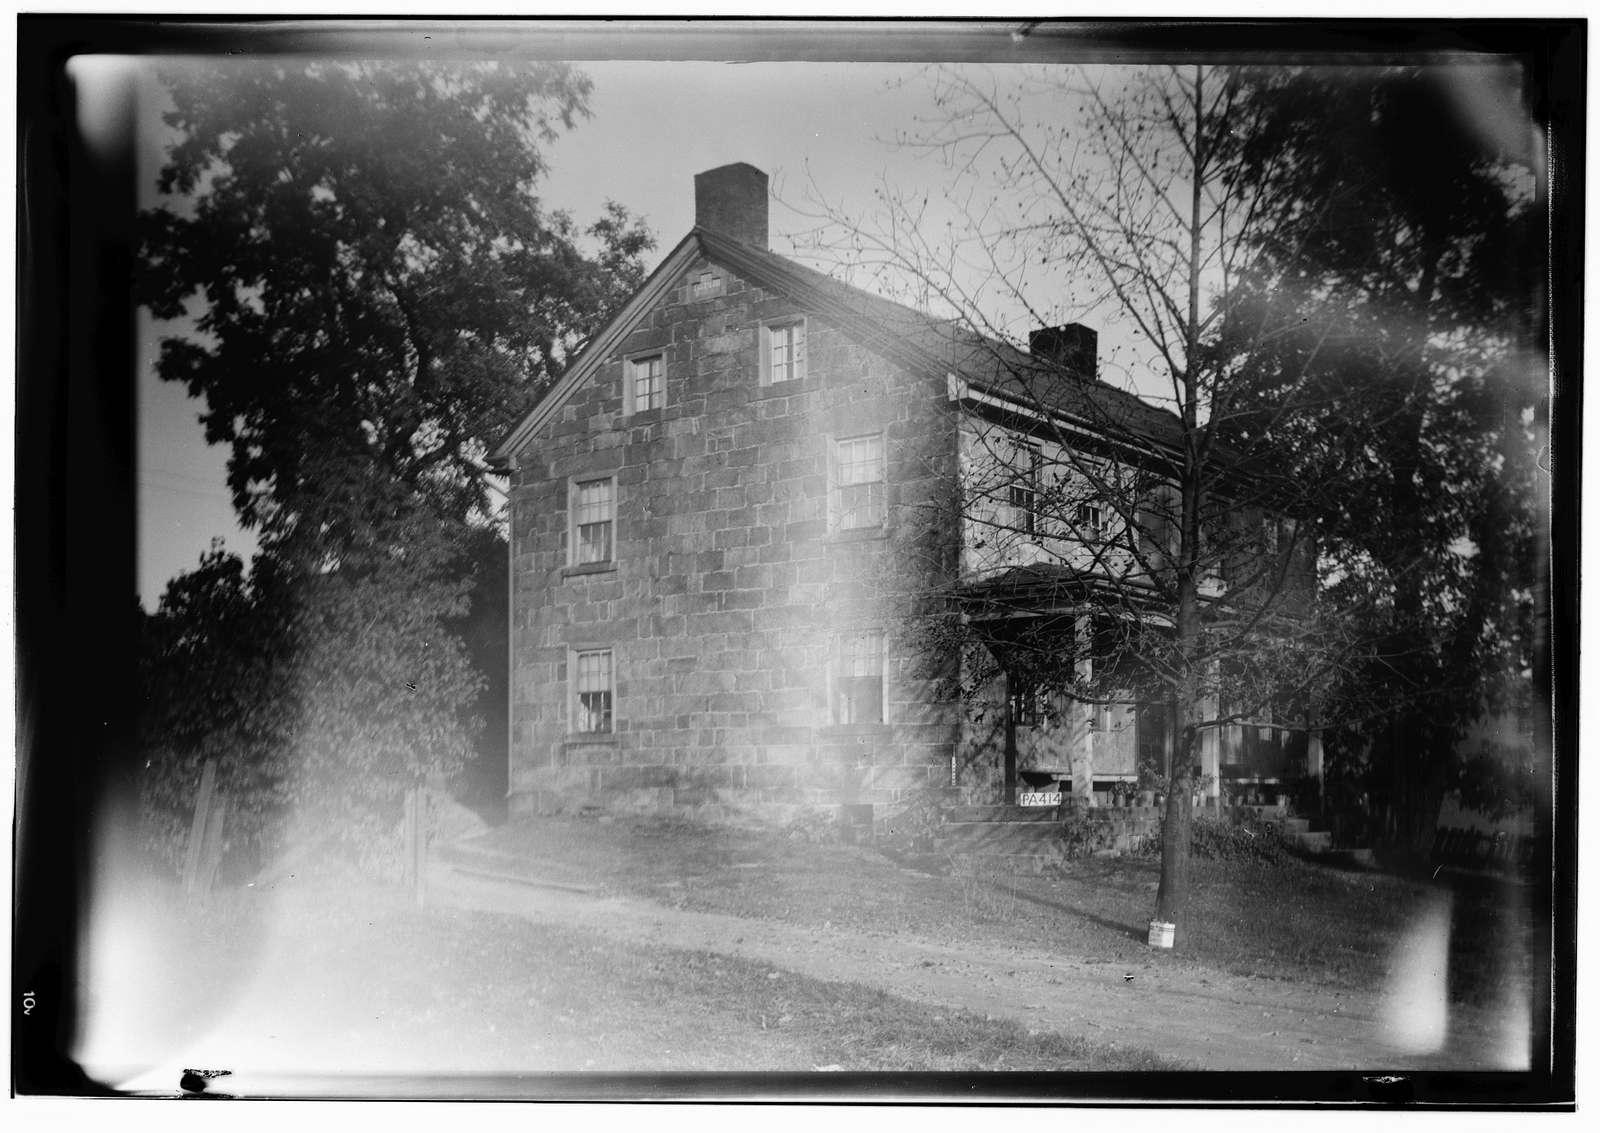 David Stauffer Farm Buildings, Harmony, Butler County, PA